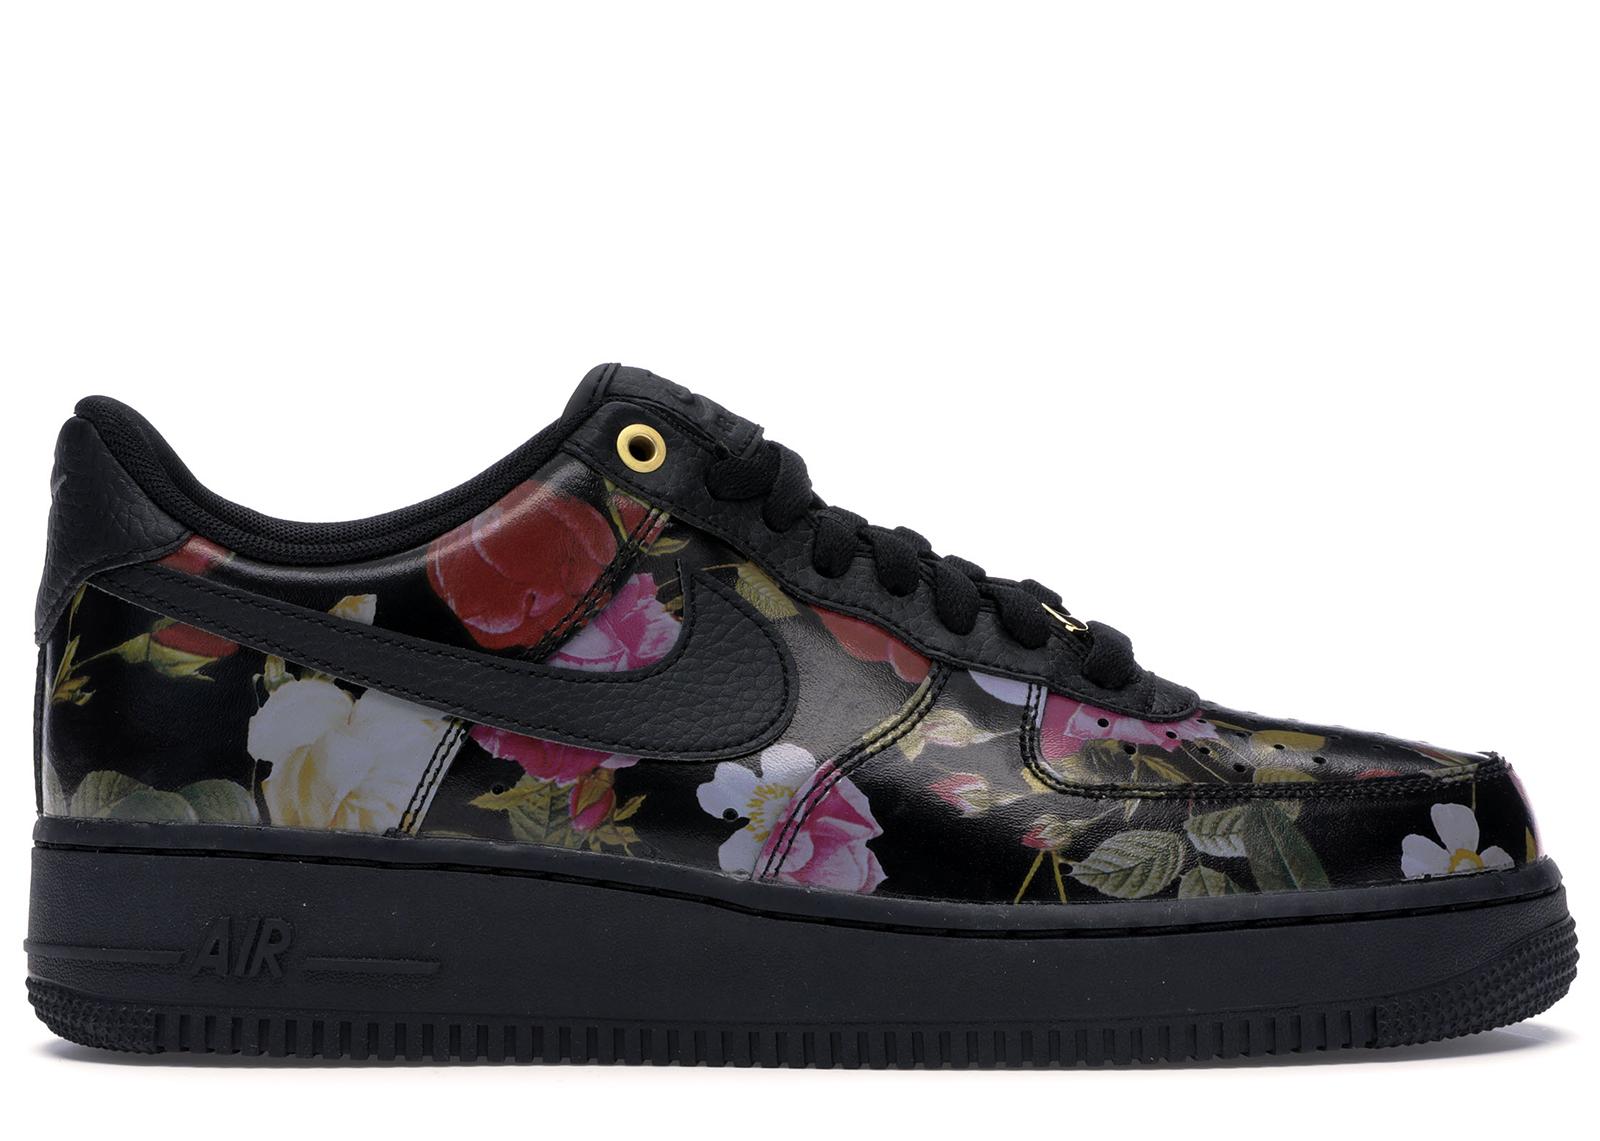 Nike Air Force 1 Low Black Floral (W